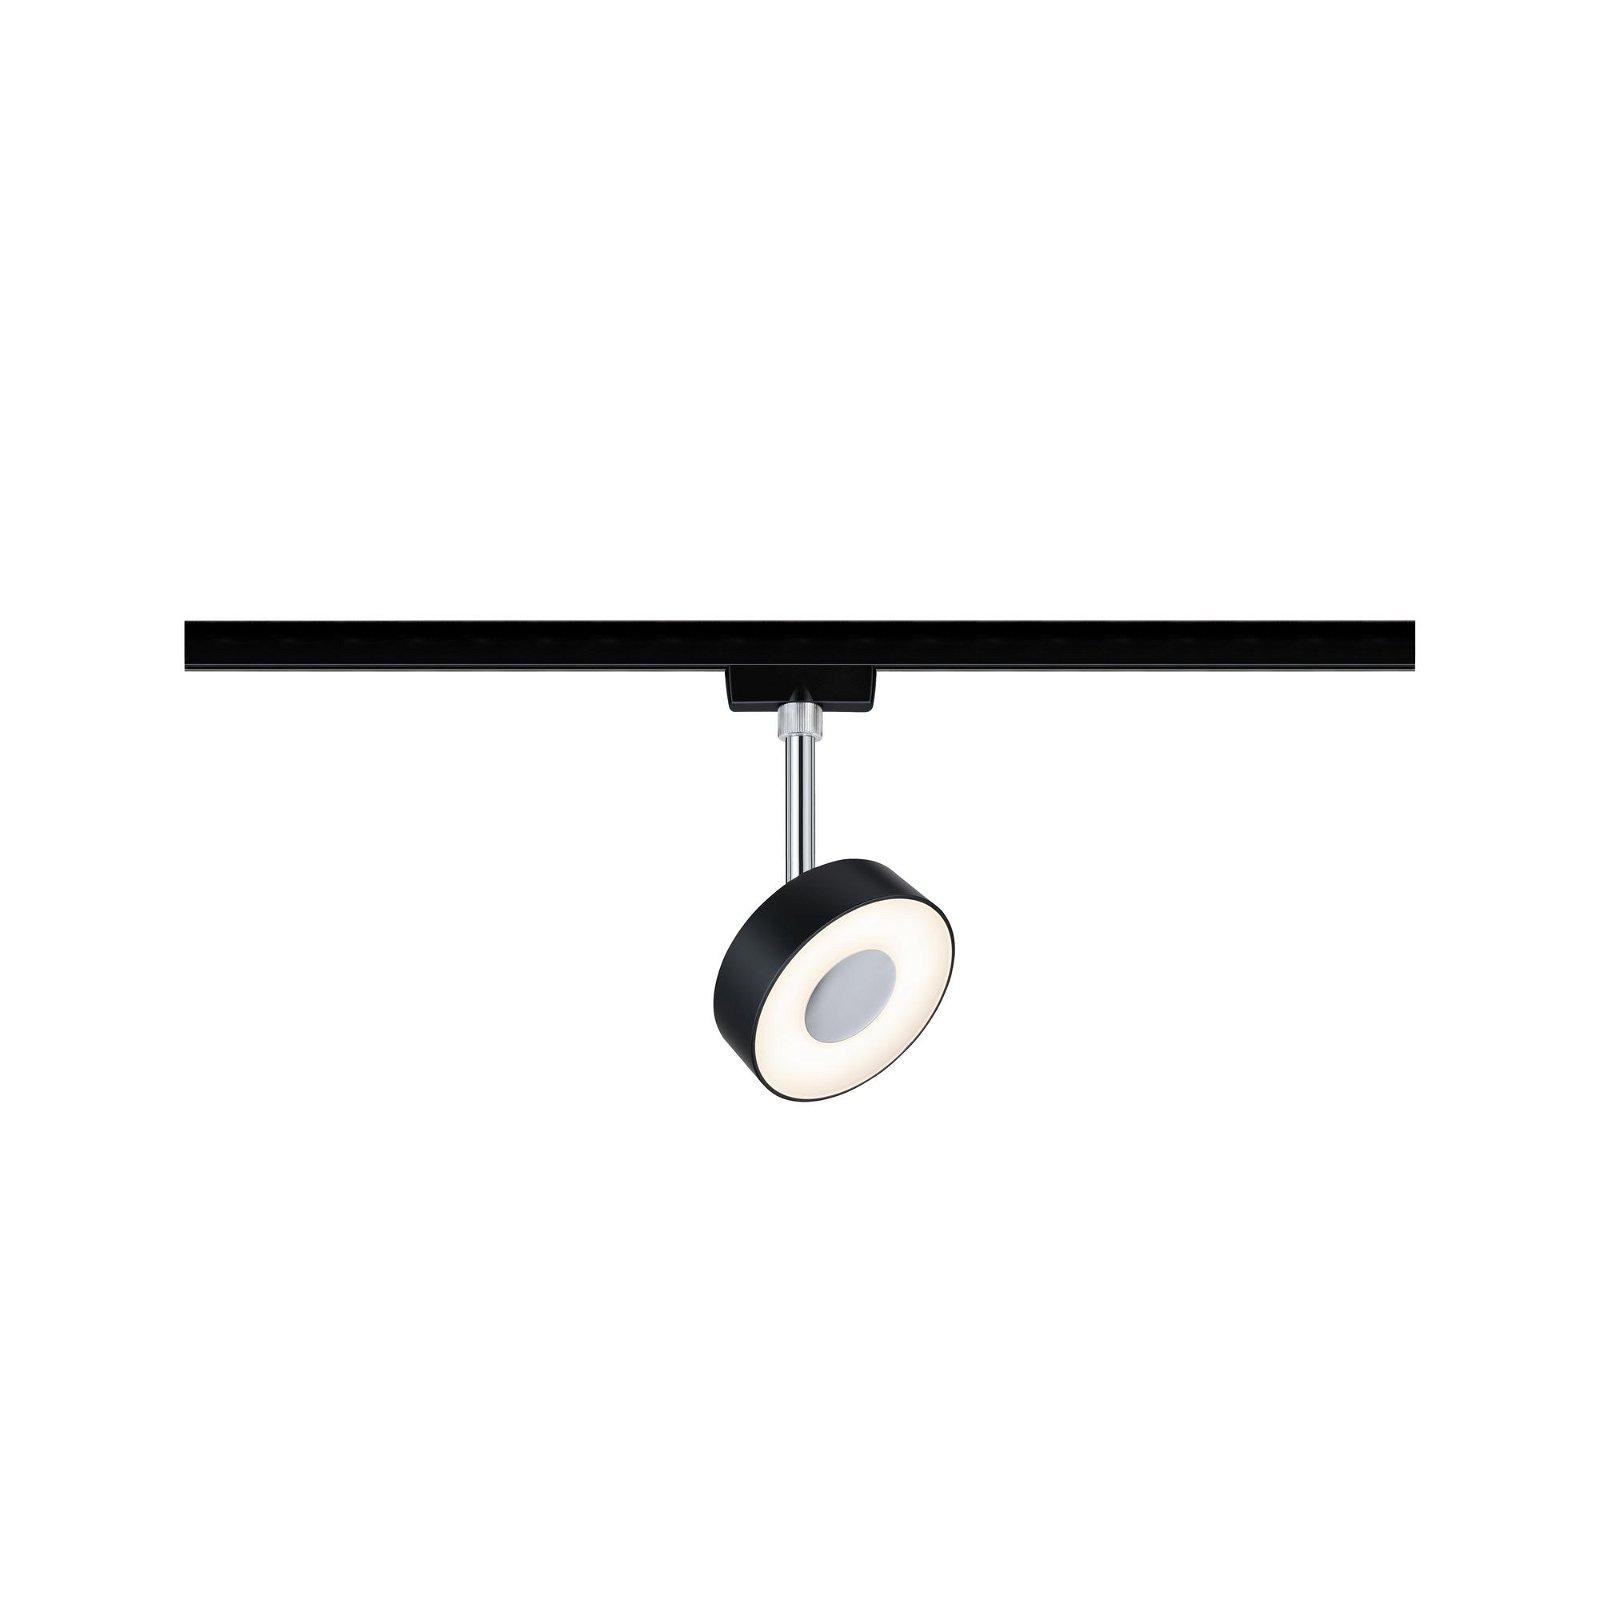 URail LED Schienenspot Circle 355lm 5W 2700K 230V Schwarz matt/Chrom